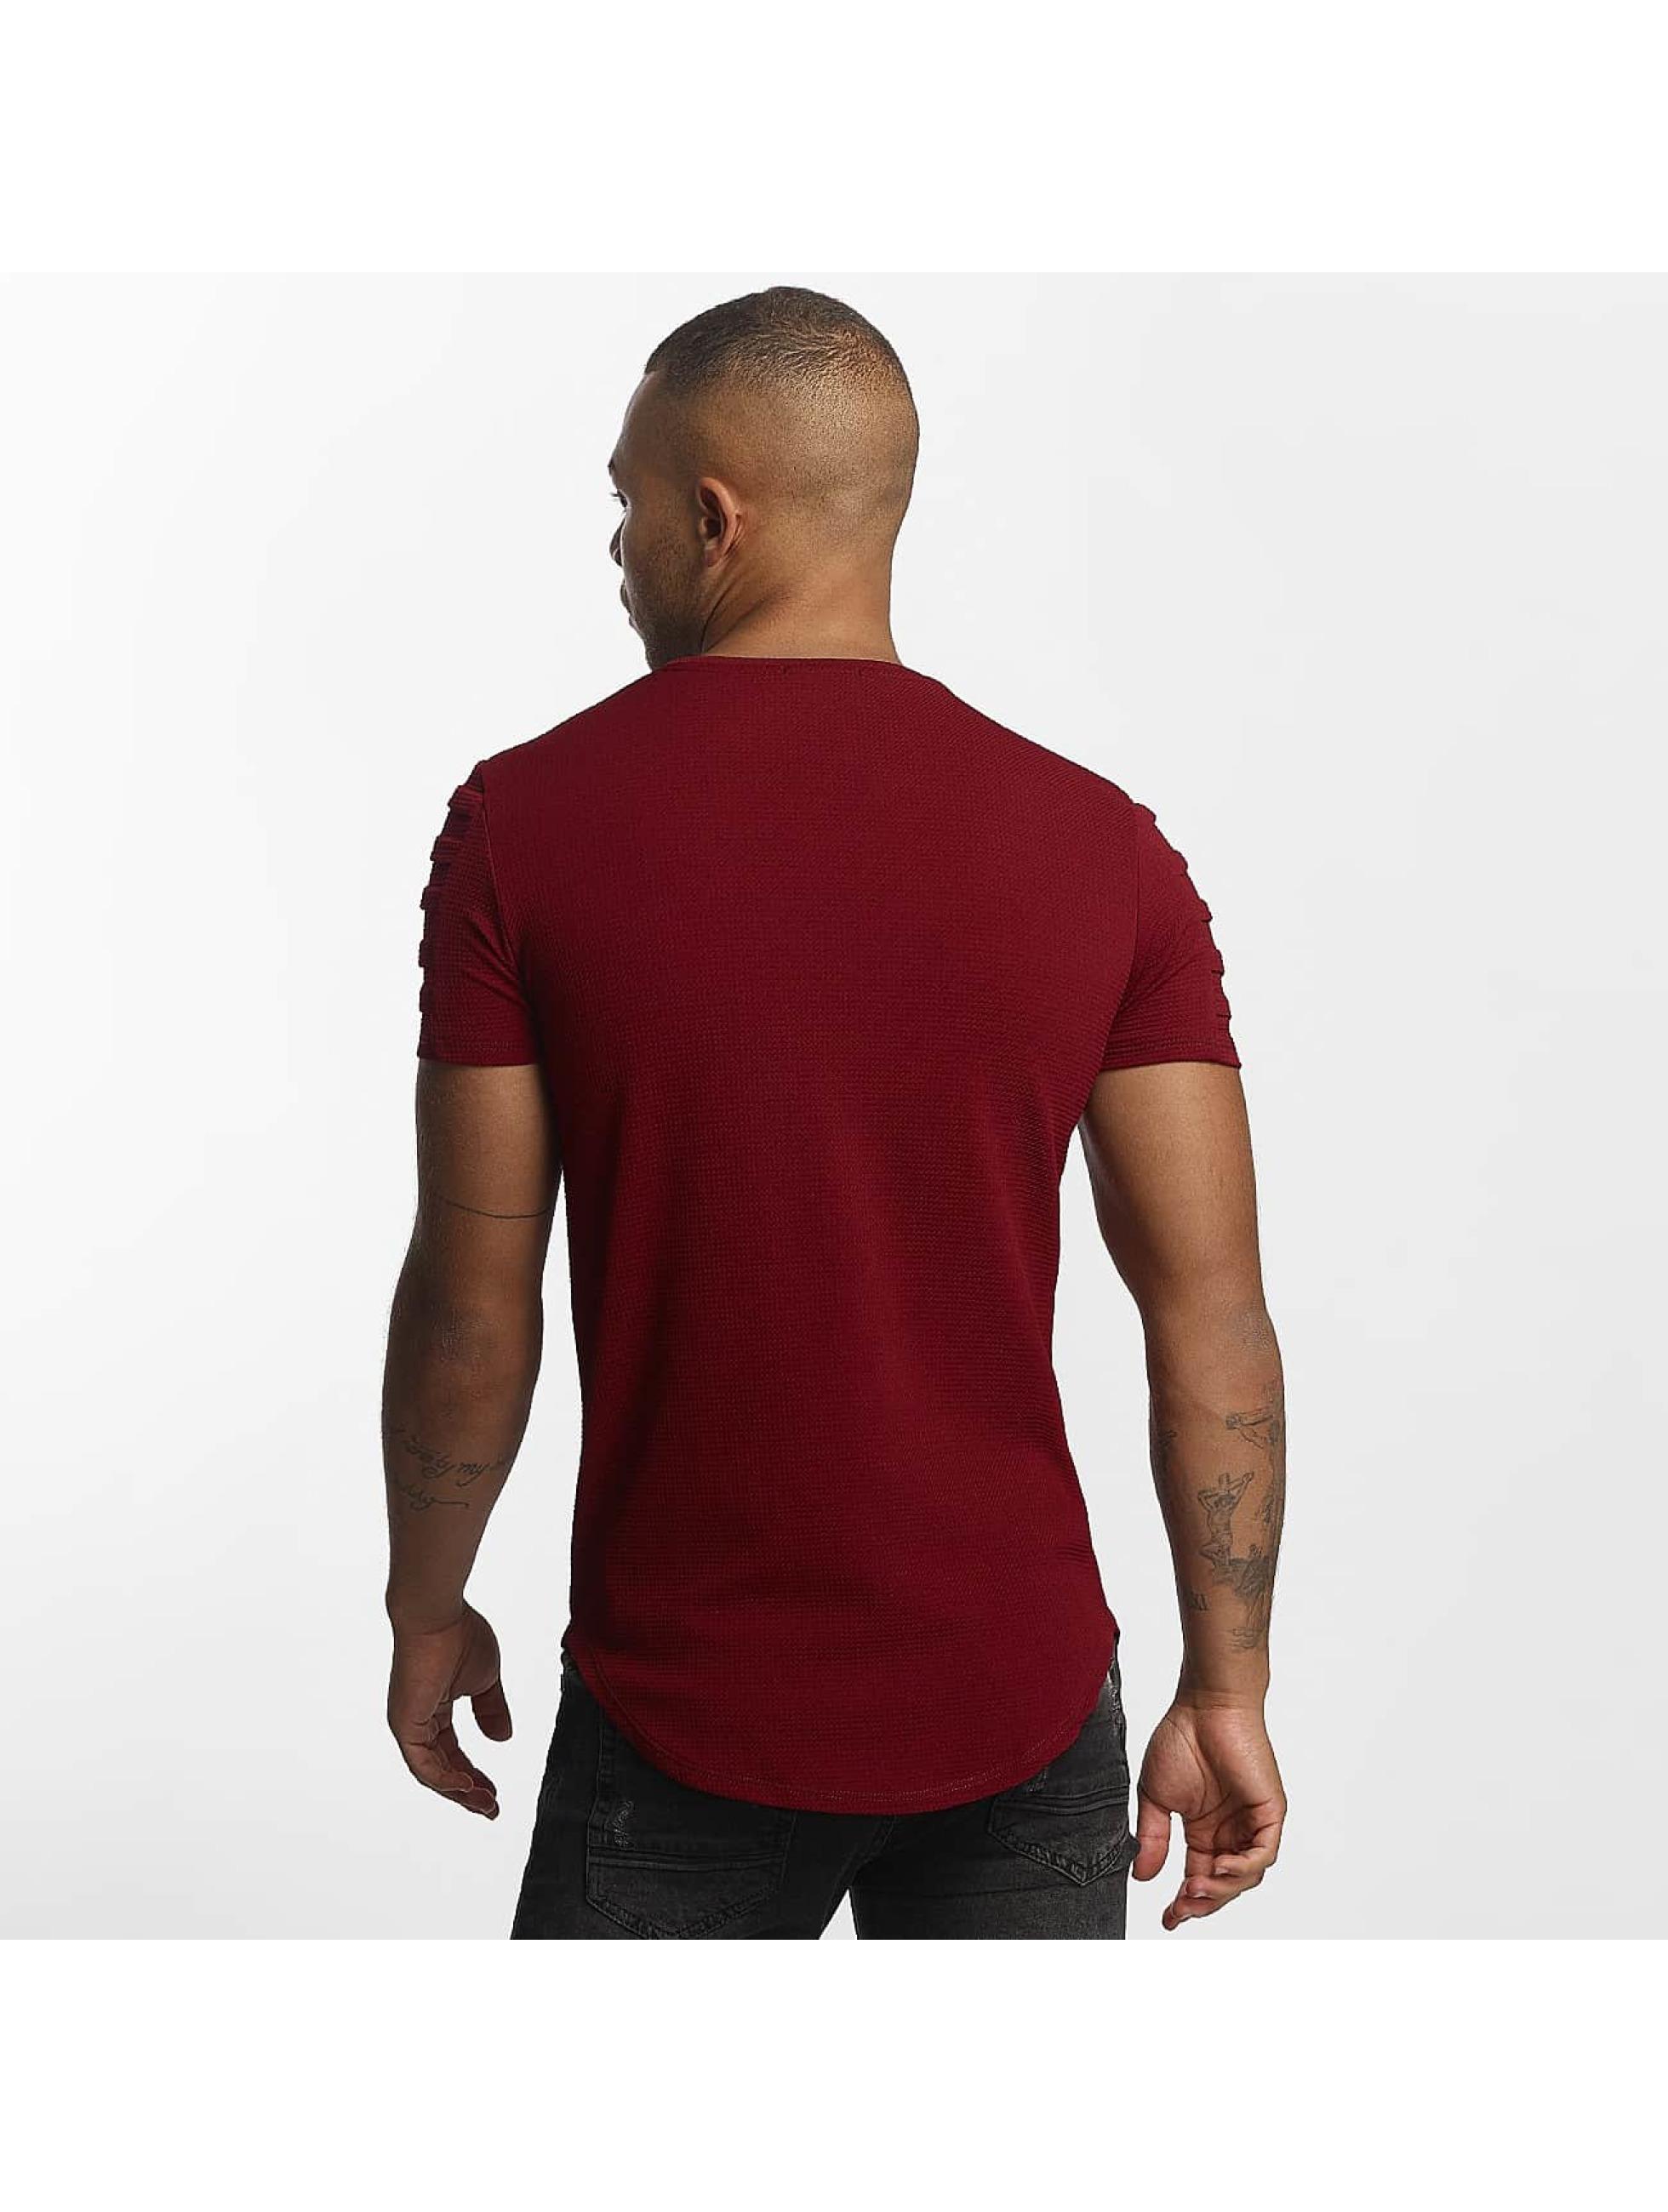 Uniplay Camiseta Embossed rojo